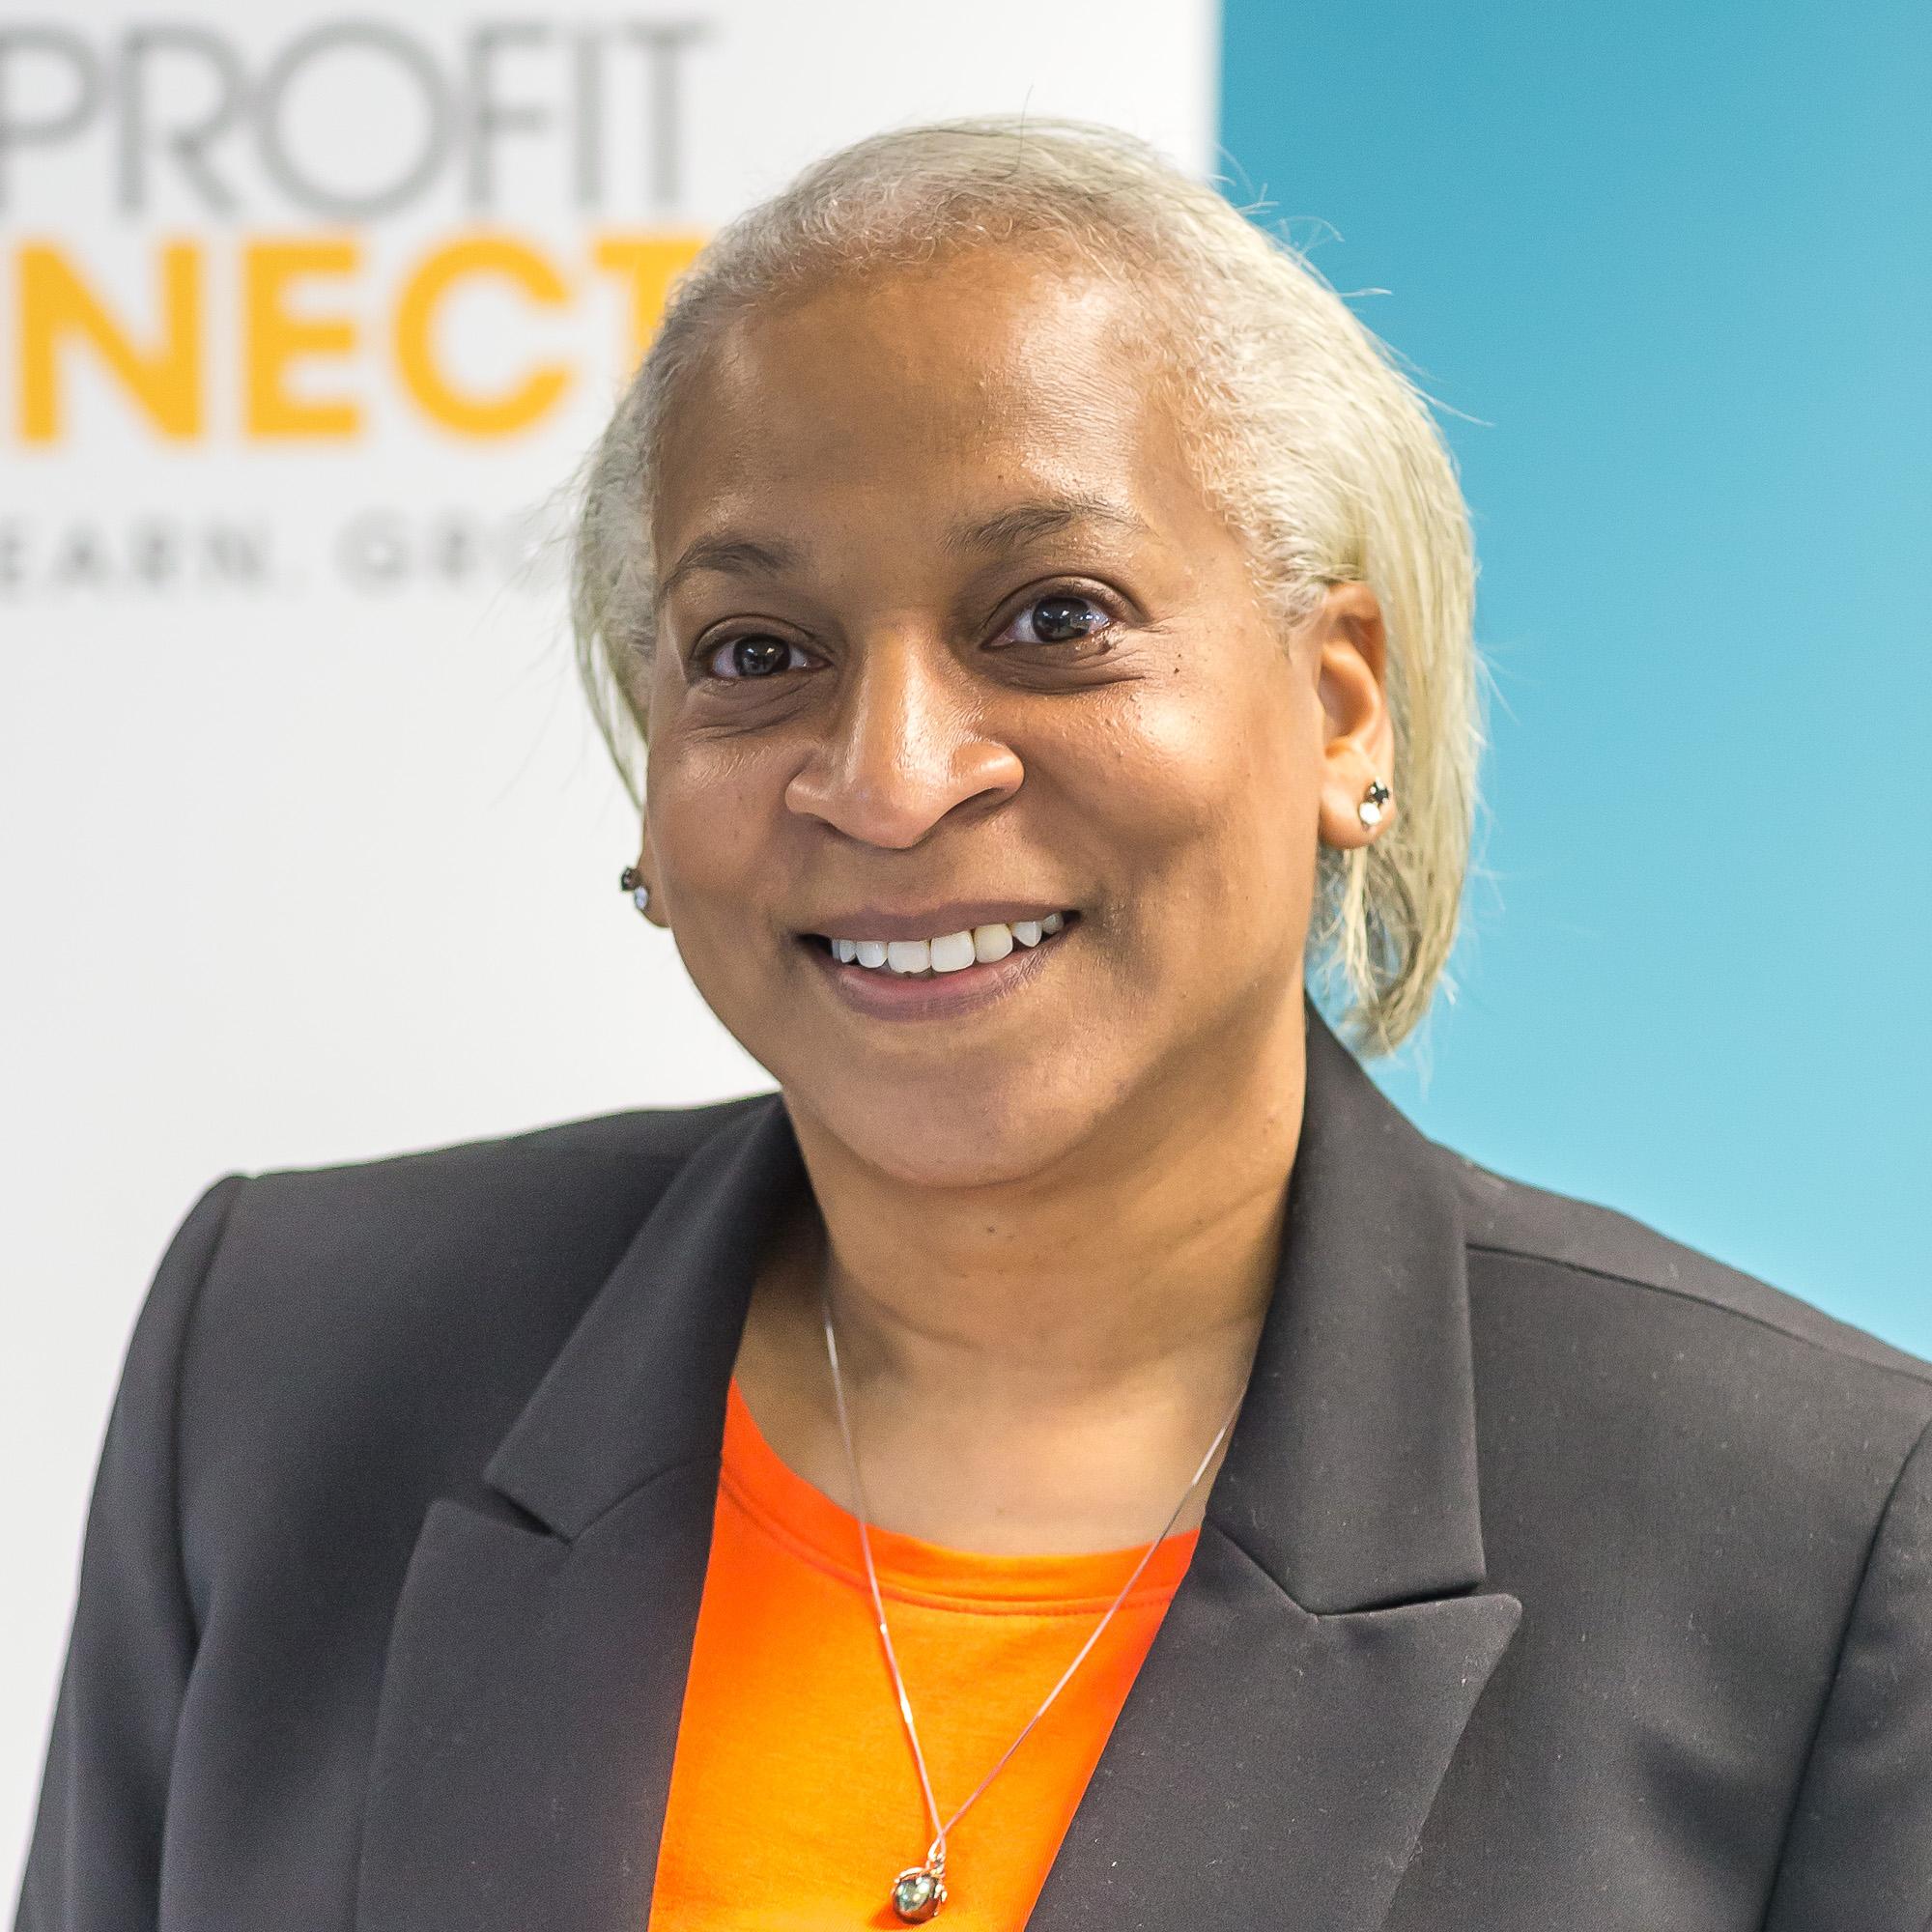 Valerie Nicholson-Watson, Vice President